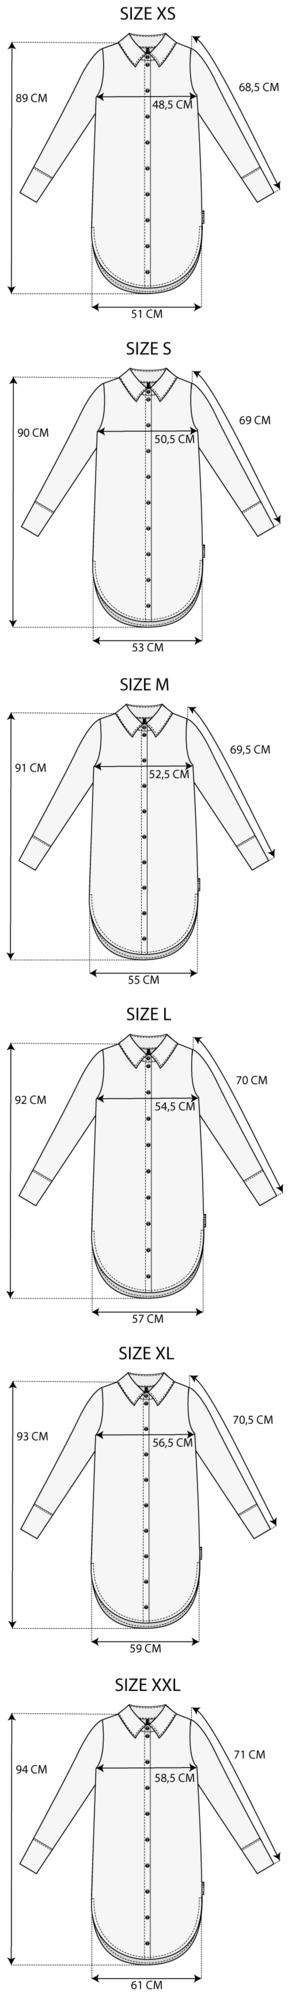 Maattabel tunic blauw